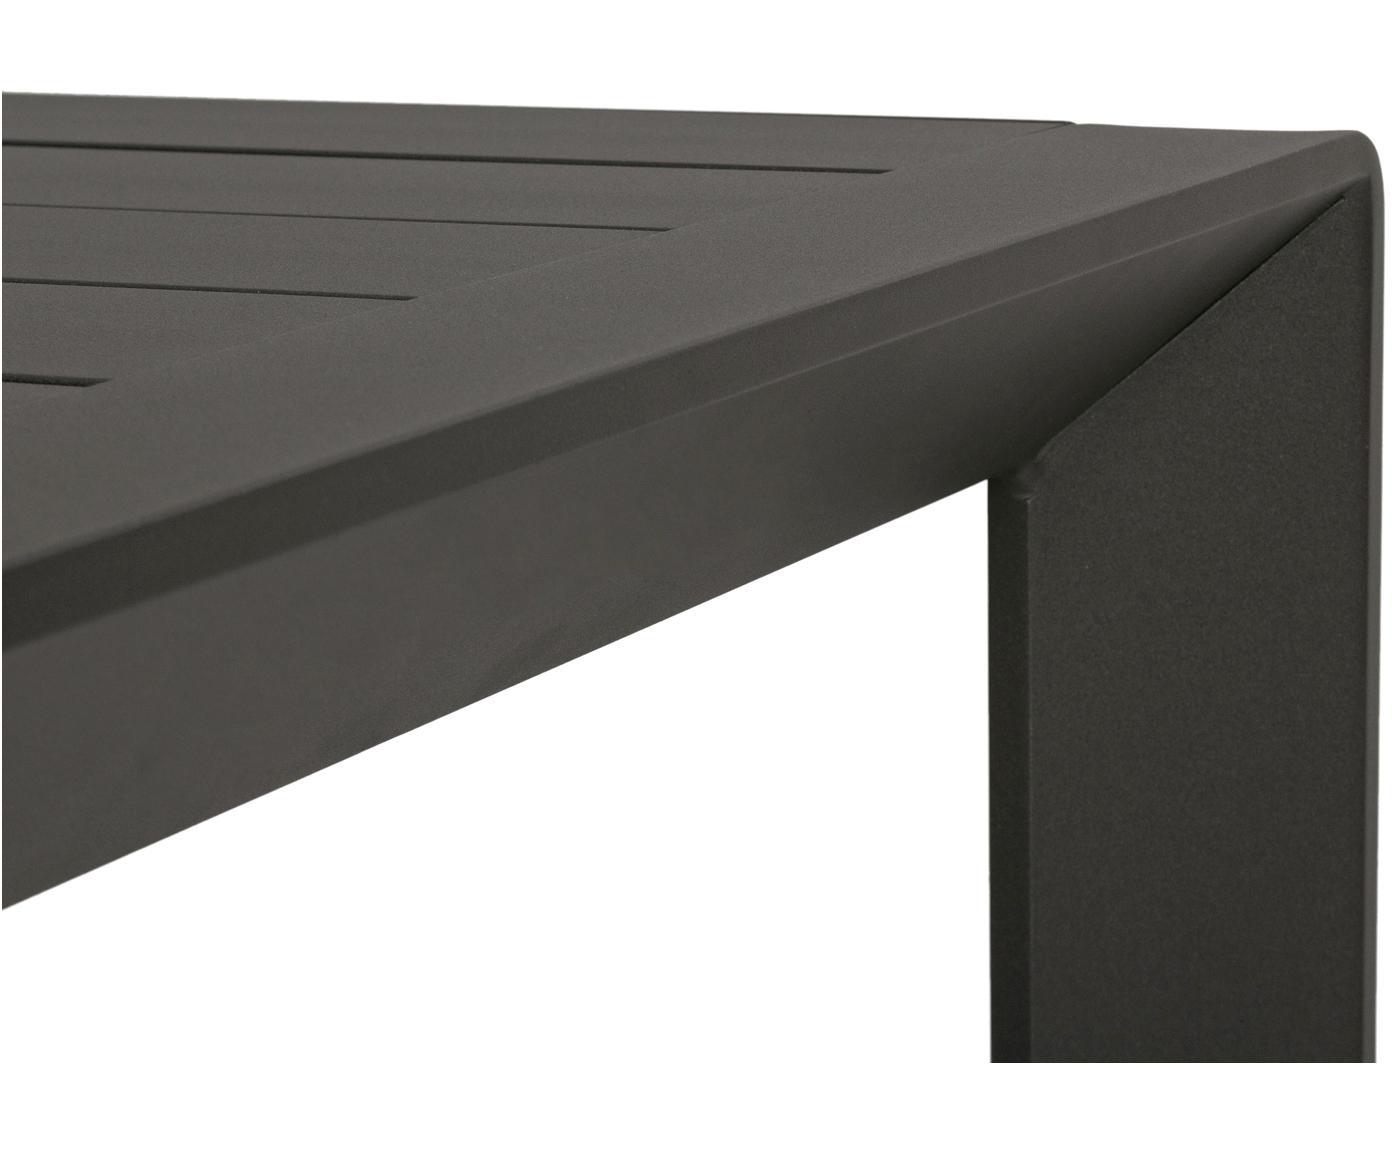 Tuintafel Kirby, Gepoedercoat aluminium, Antraciet, B 180 x D 90 cm